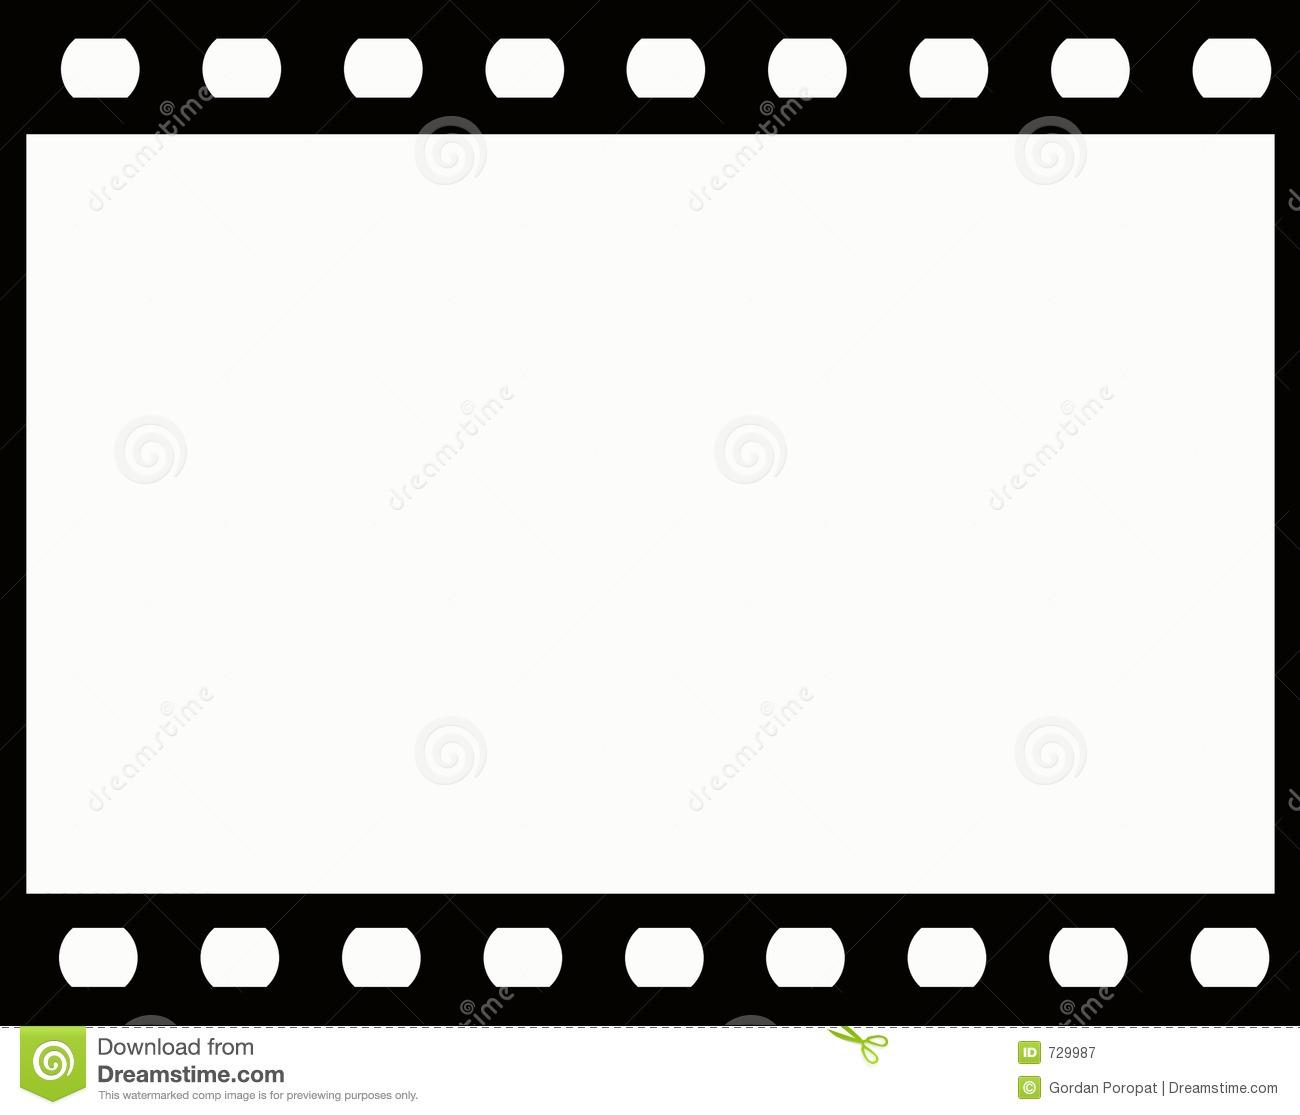 movie-film-clip-art-clip-art-film-frame-jcyJhf-clipart.jpg